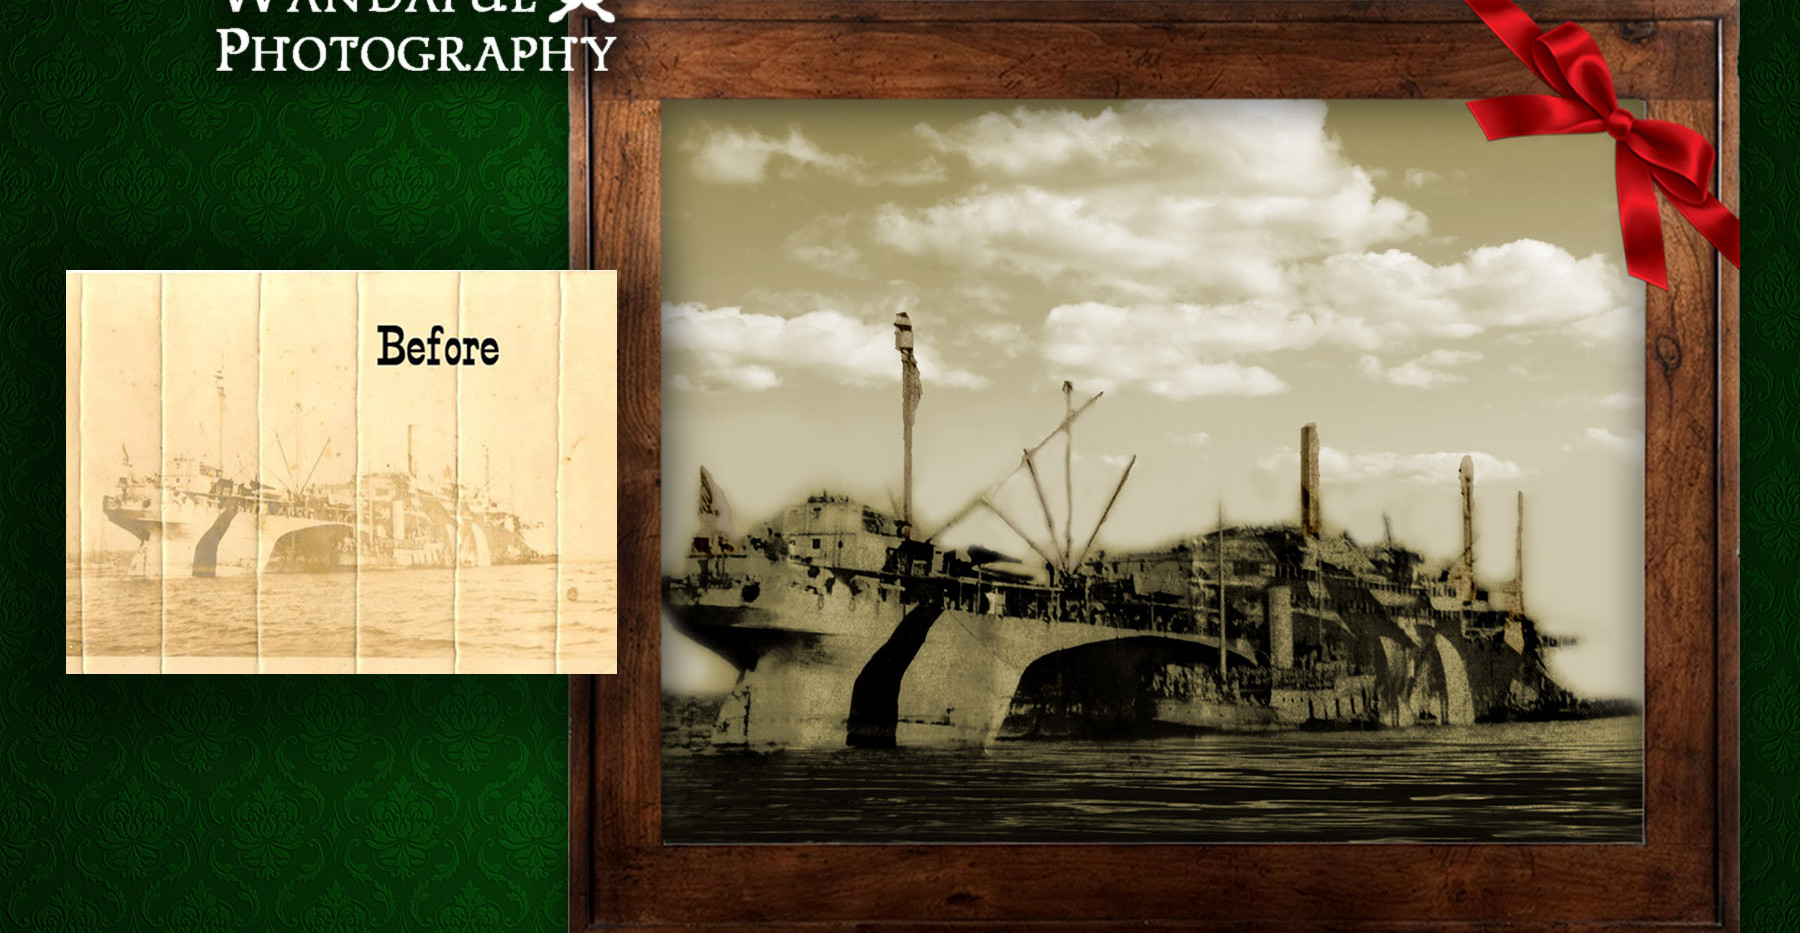 Ledford Ship Photo restored.jpg